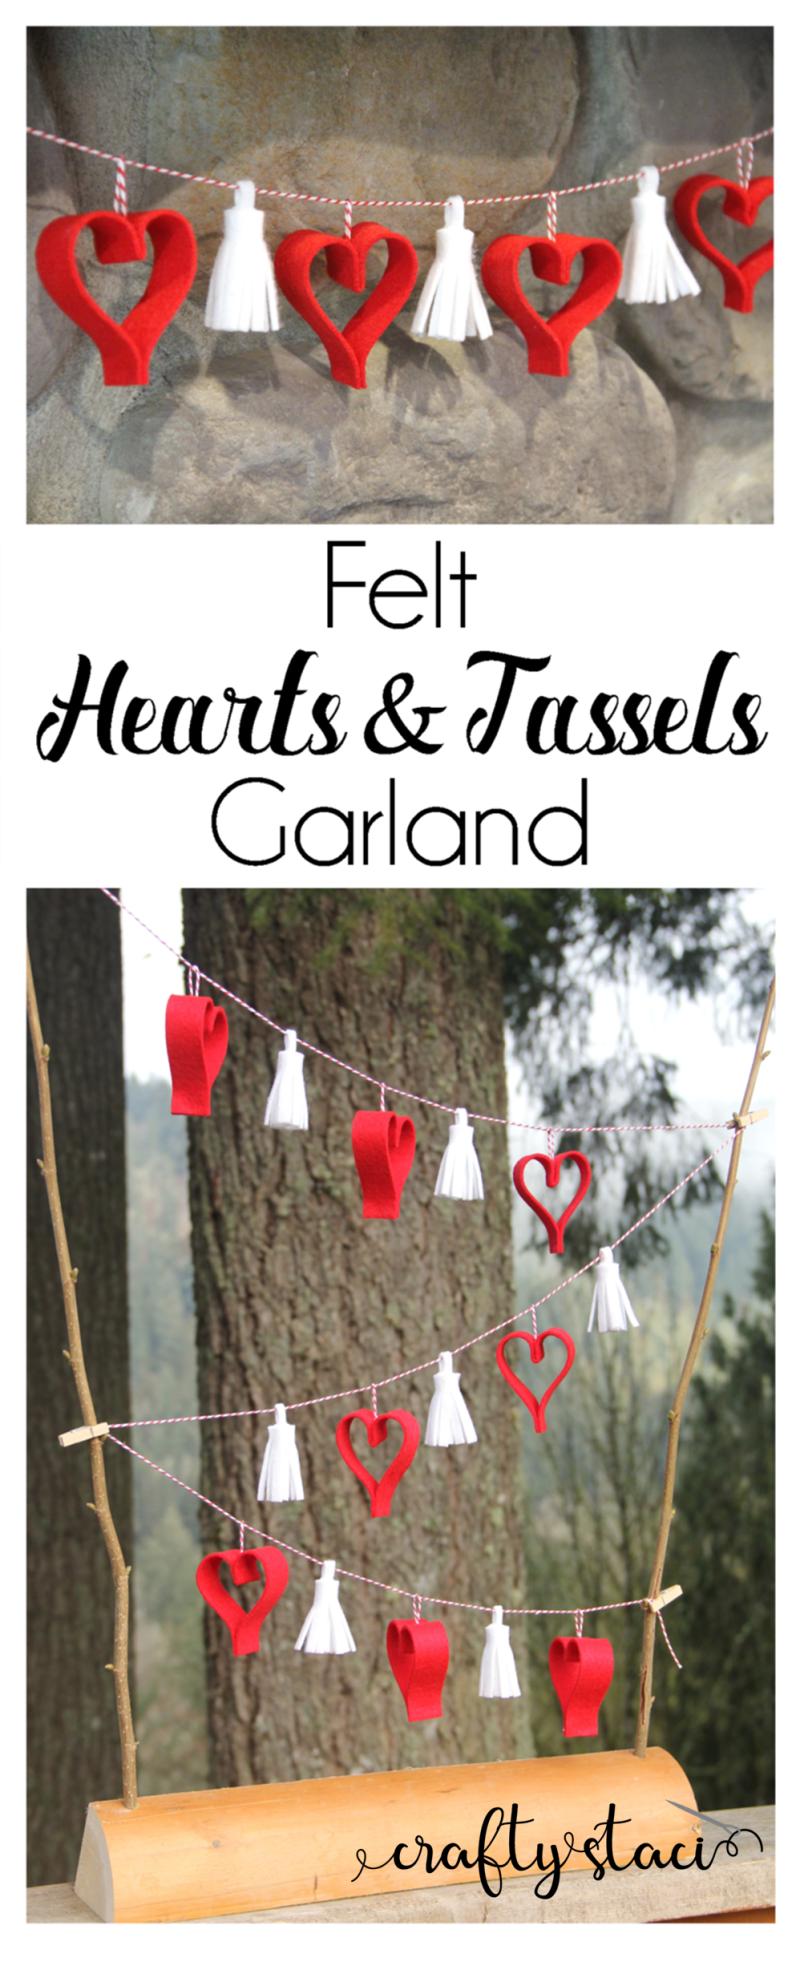 Hearts and Tassels Garland from craftystaci.com #feltcrafts #valentinecrafts #heartcrafts